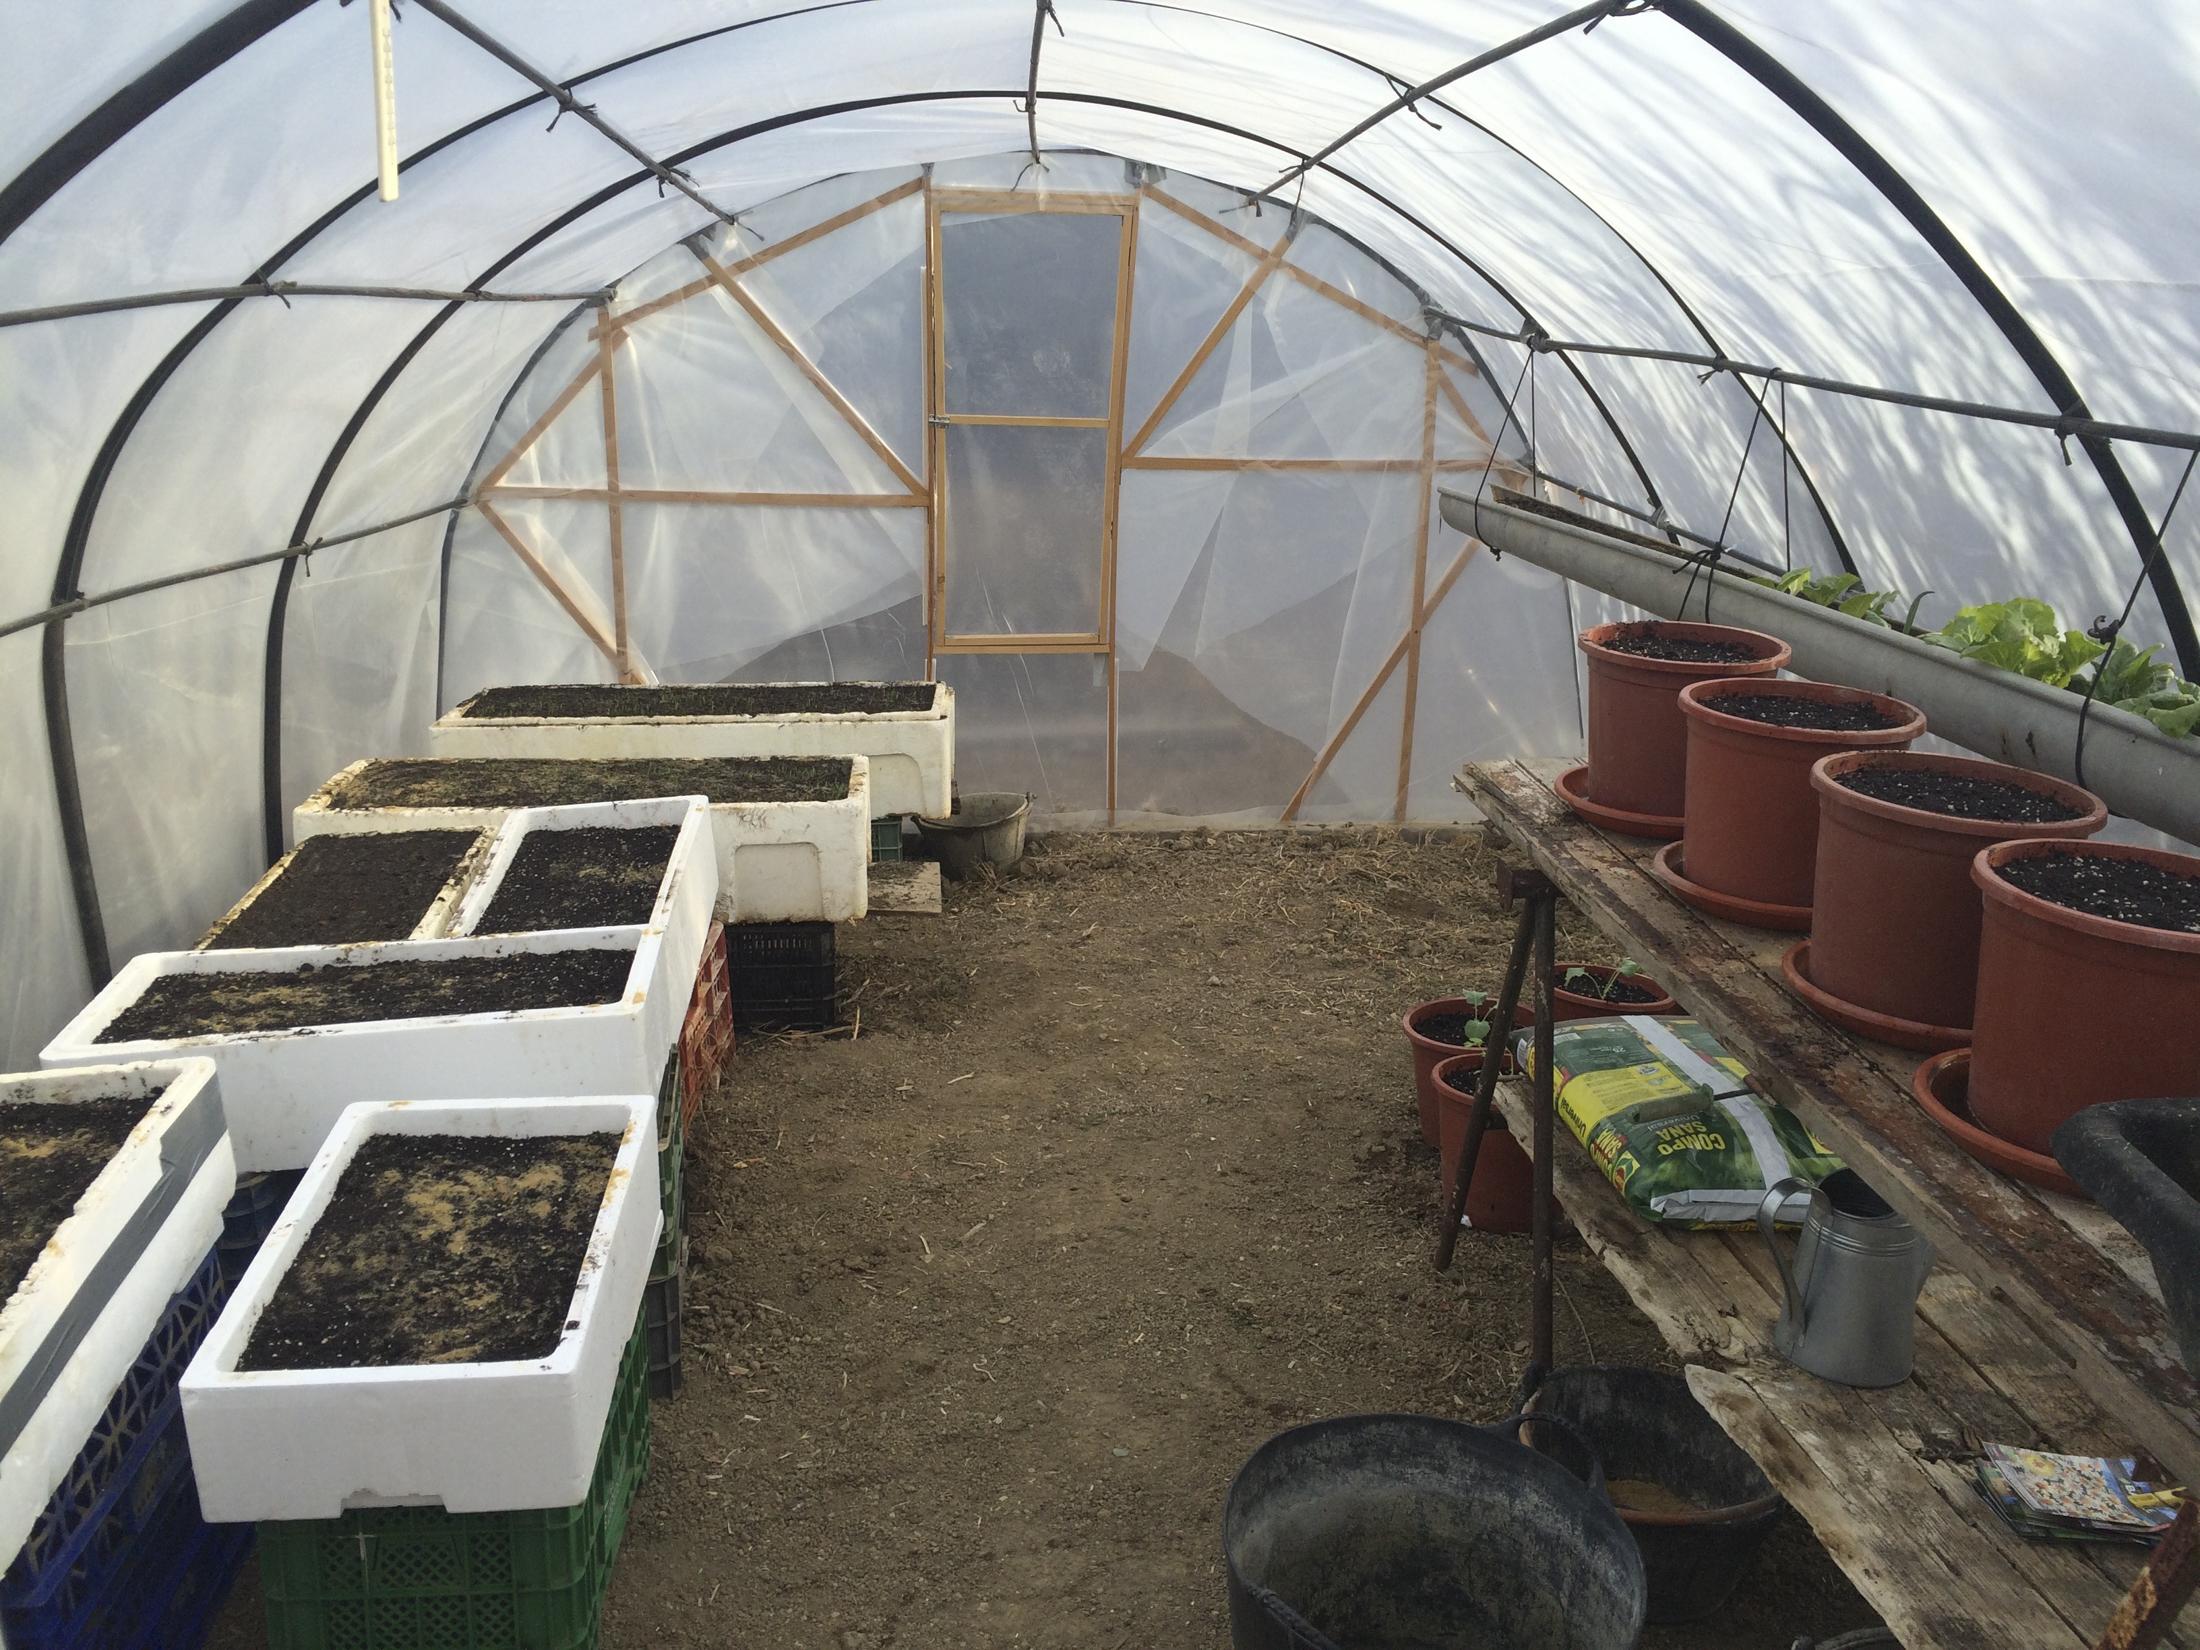 Inside the Tarifa green house